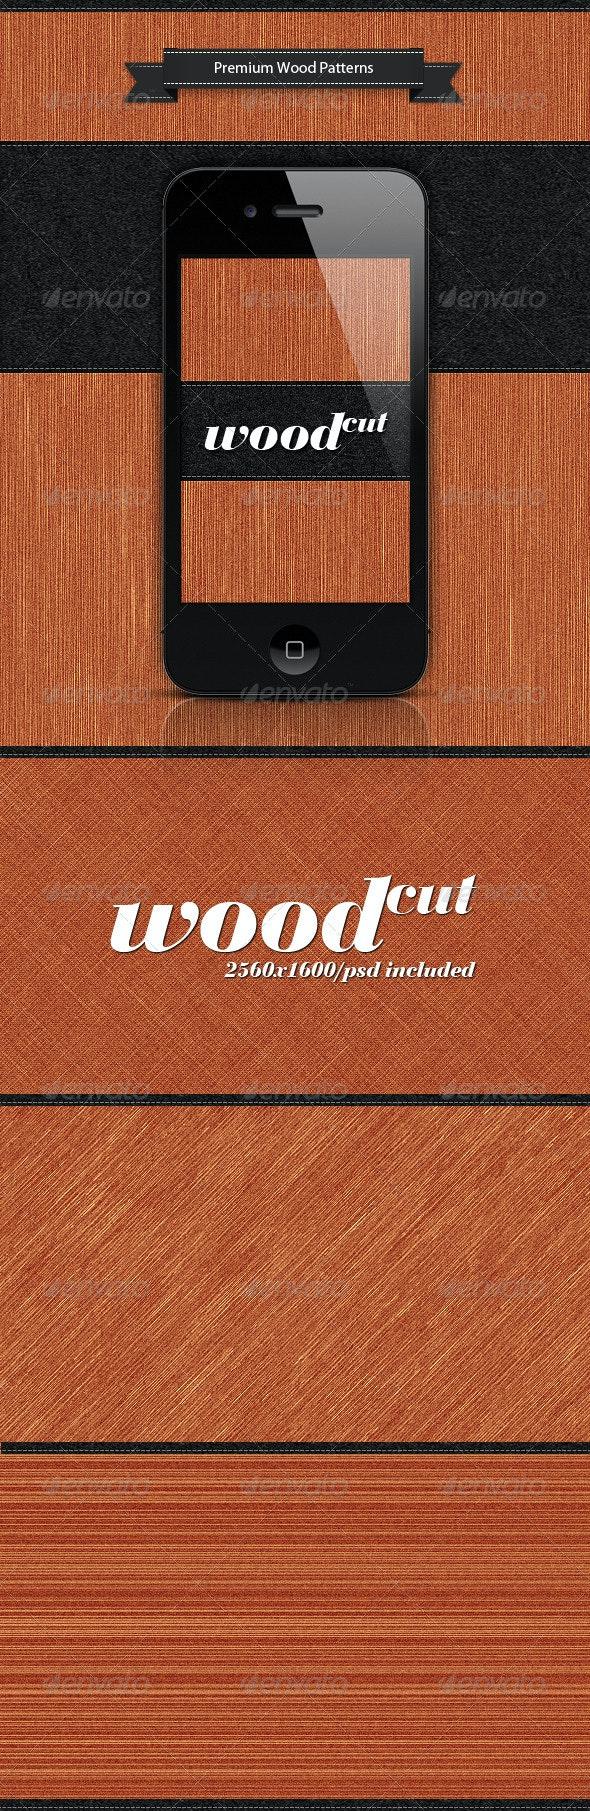 Wood Cut - Patterns Backgrounds